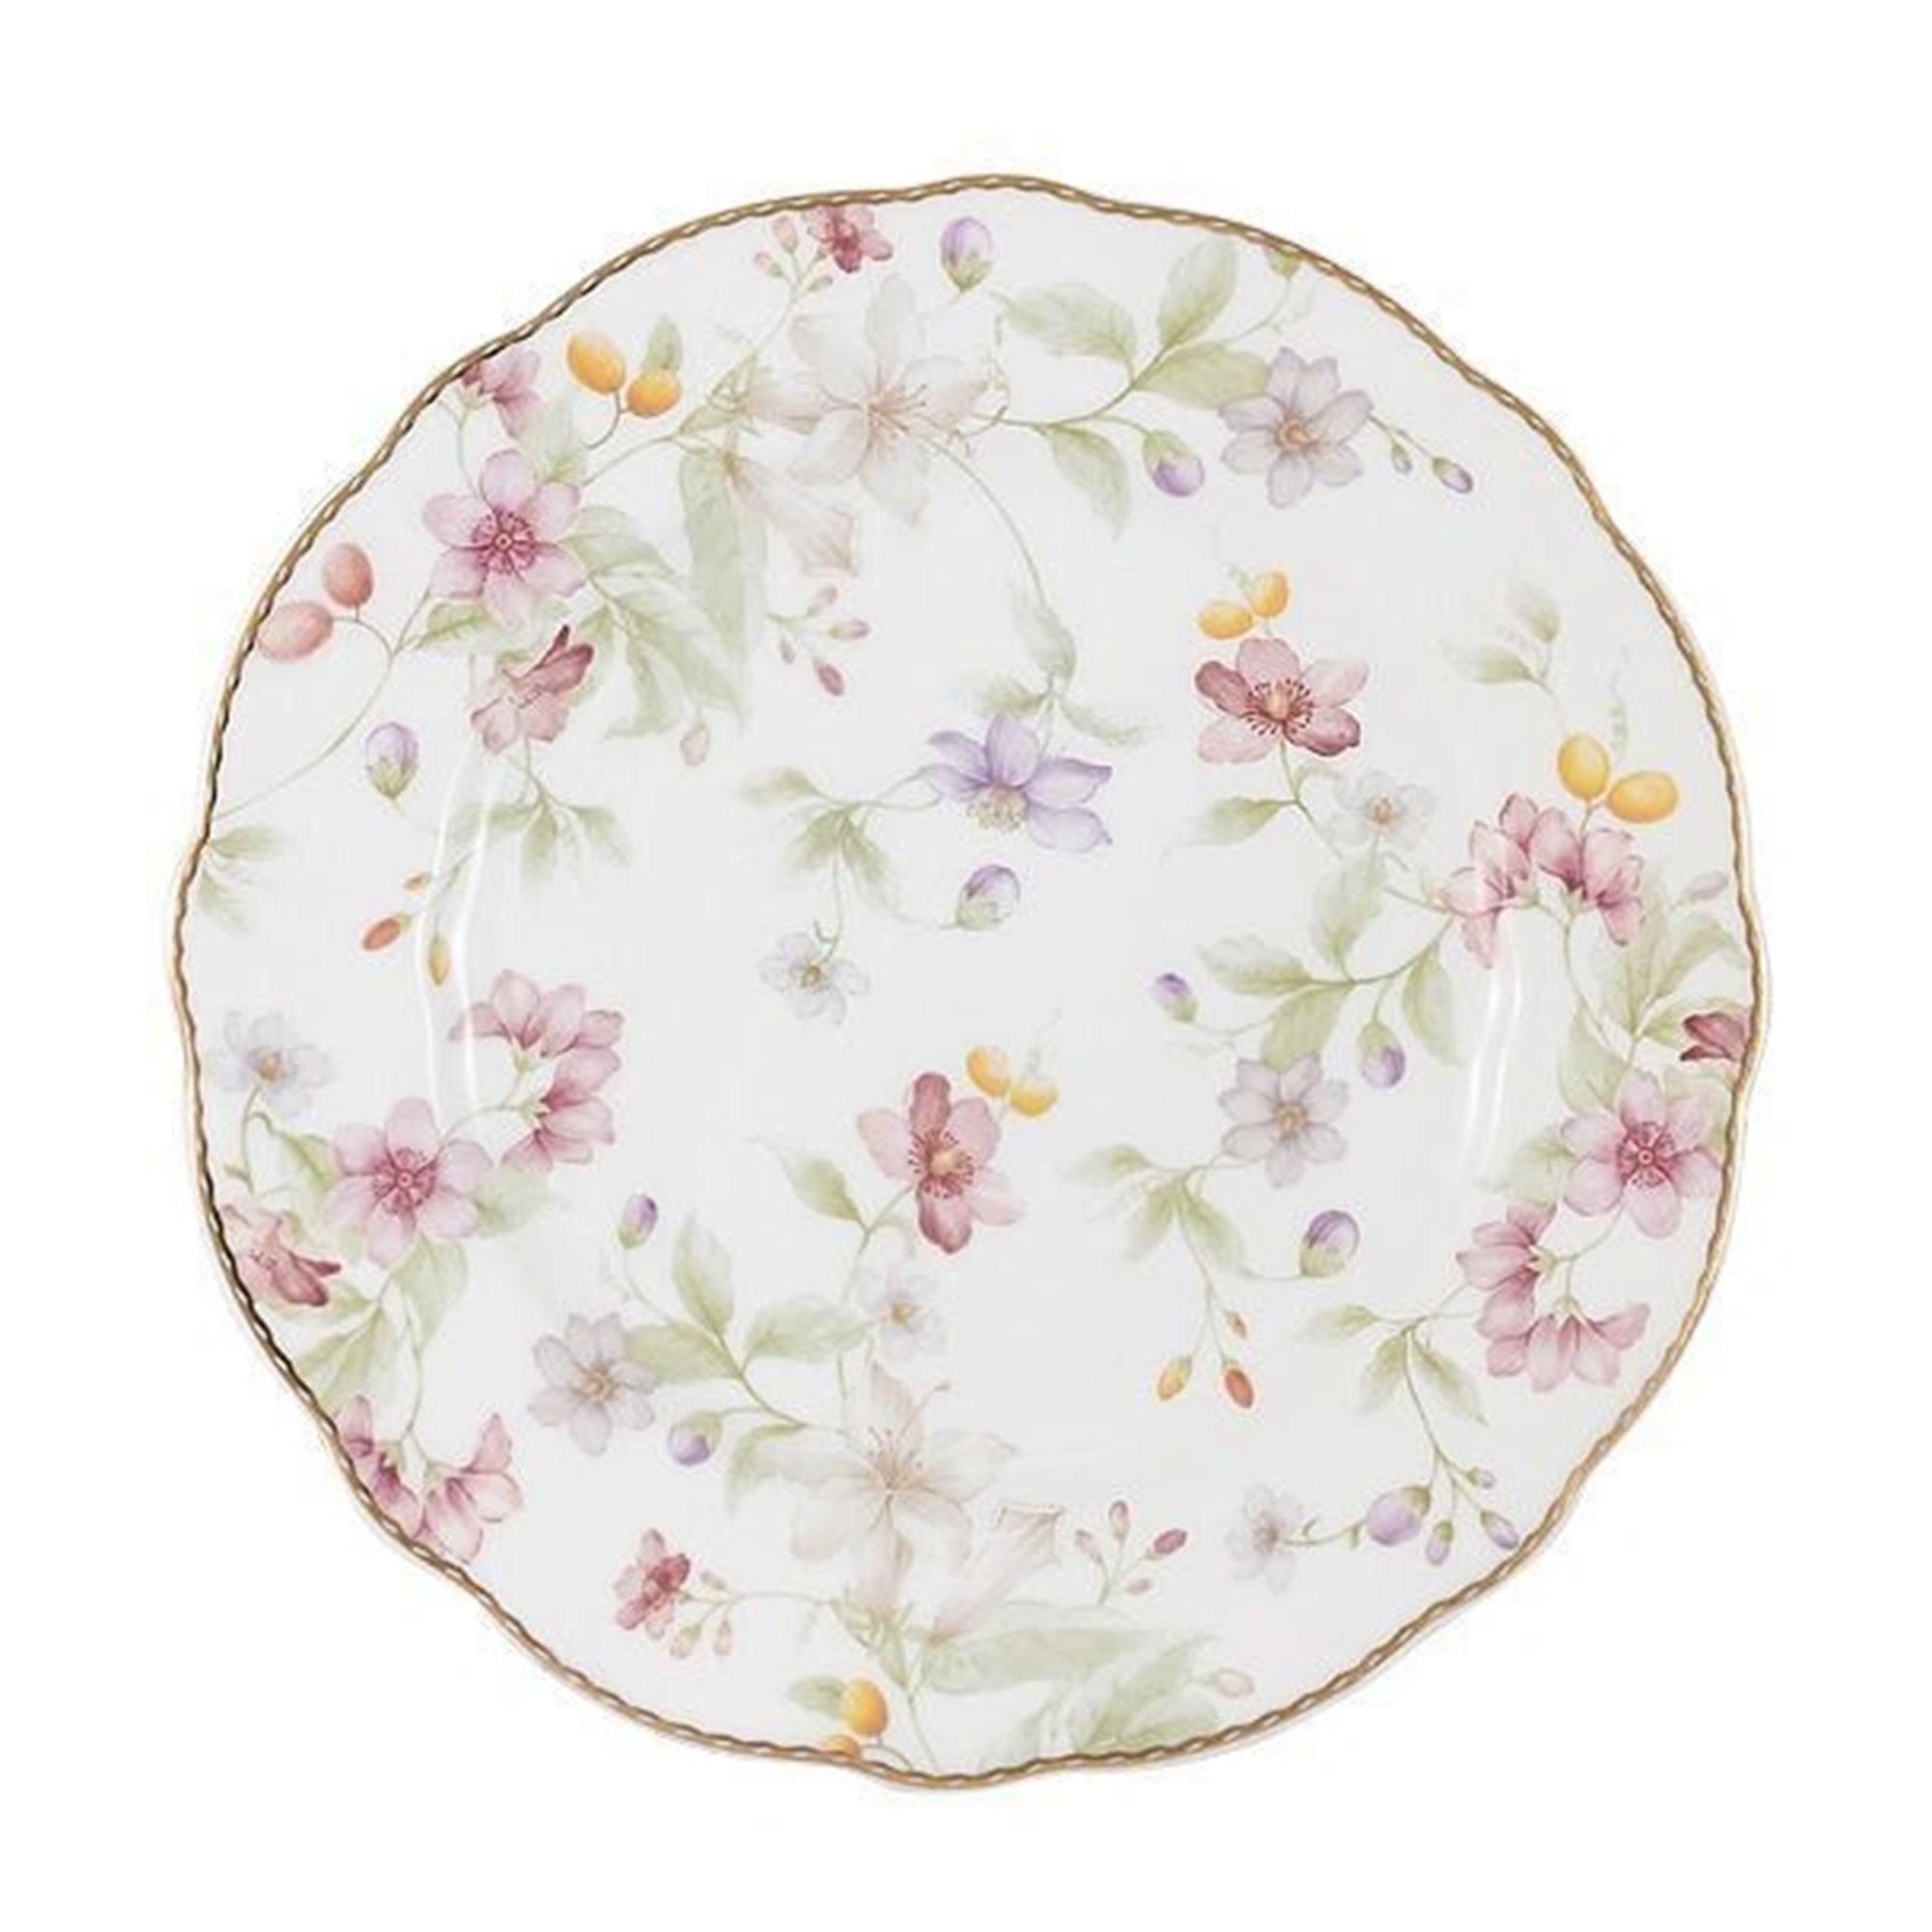 Тарелка Anna Lafarg Цветы 20 см тарелка закусочная anna lafarg emily kamelia 19 см